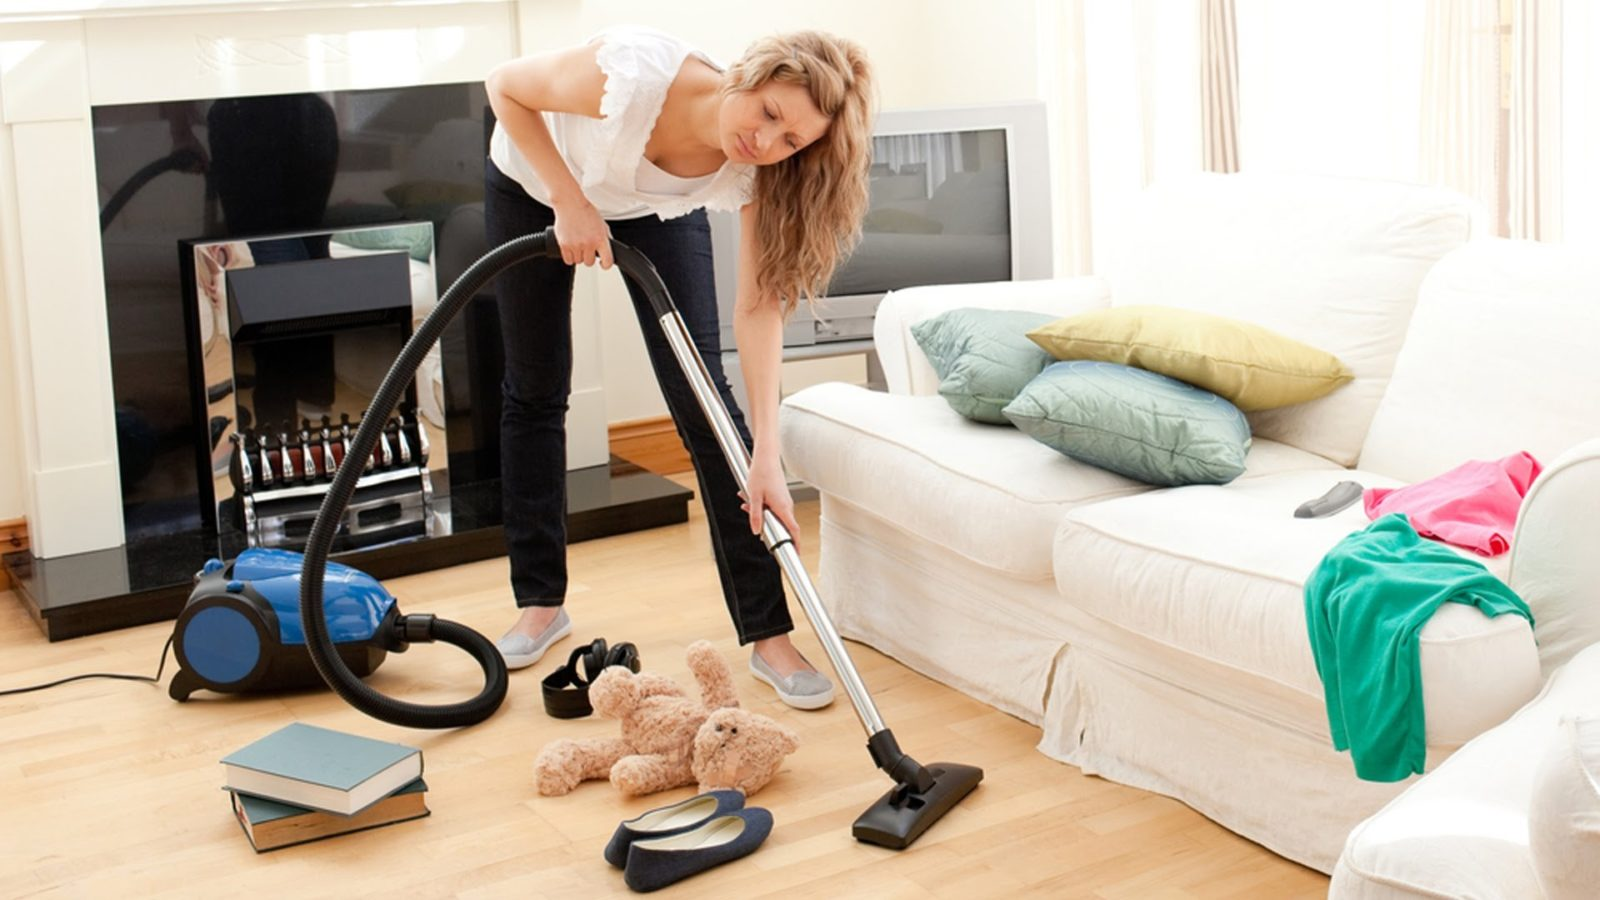 Уборка в доме обязательно условие